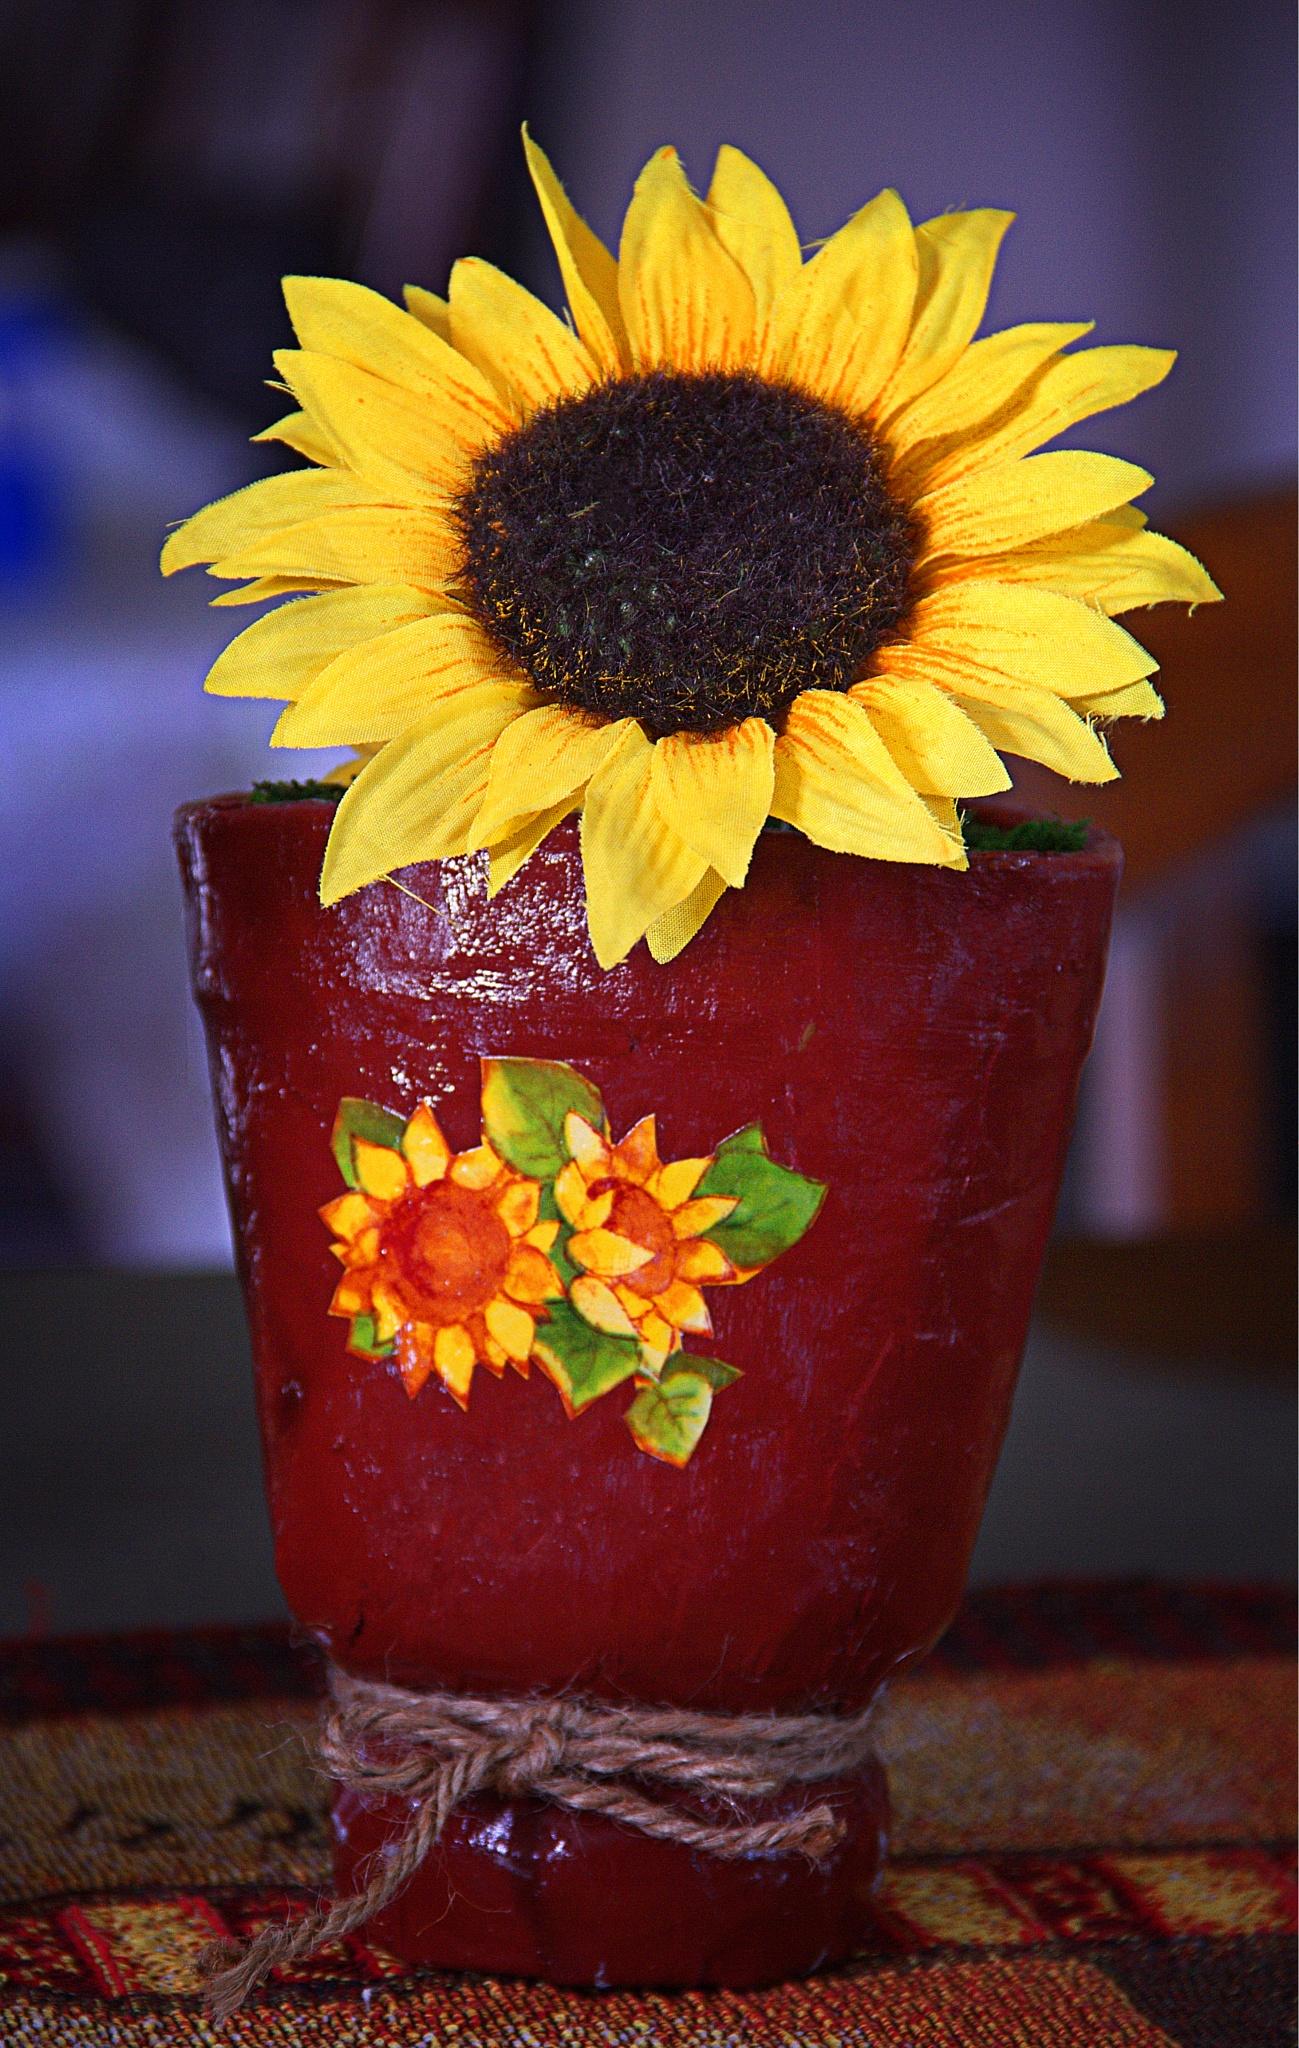 Recycled Styrofoam Planter by Hector L. Ortiz Sr.